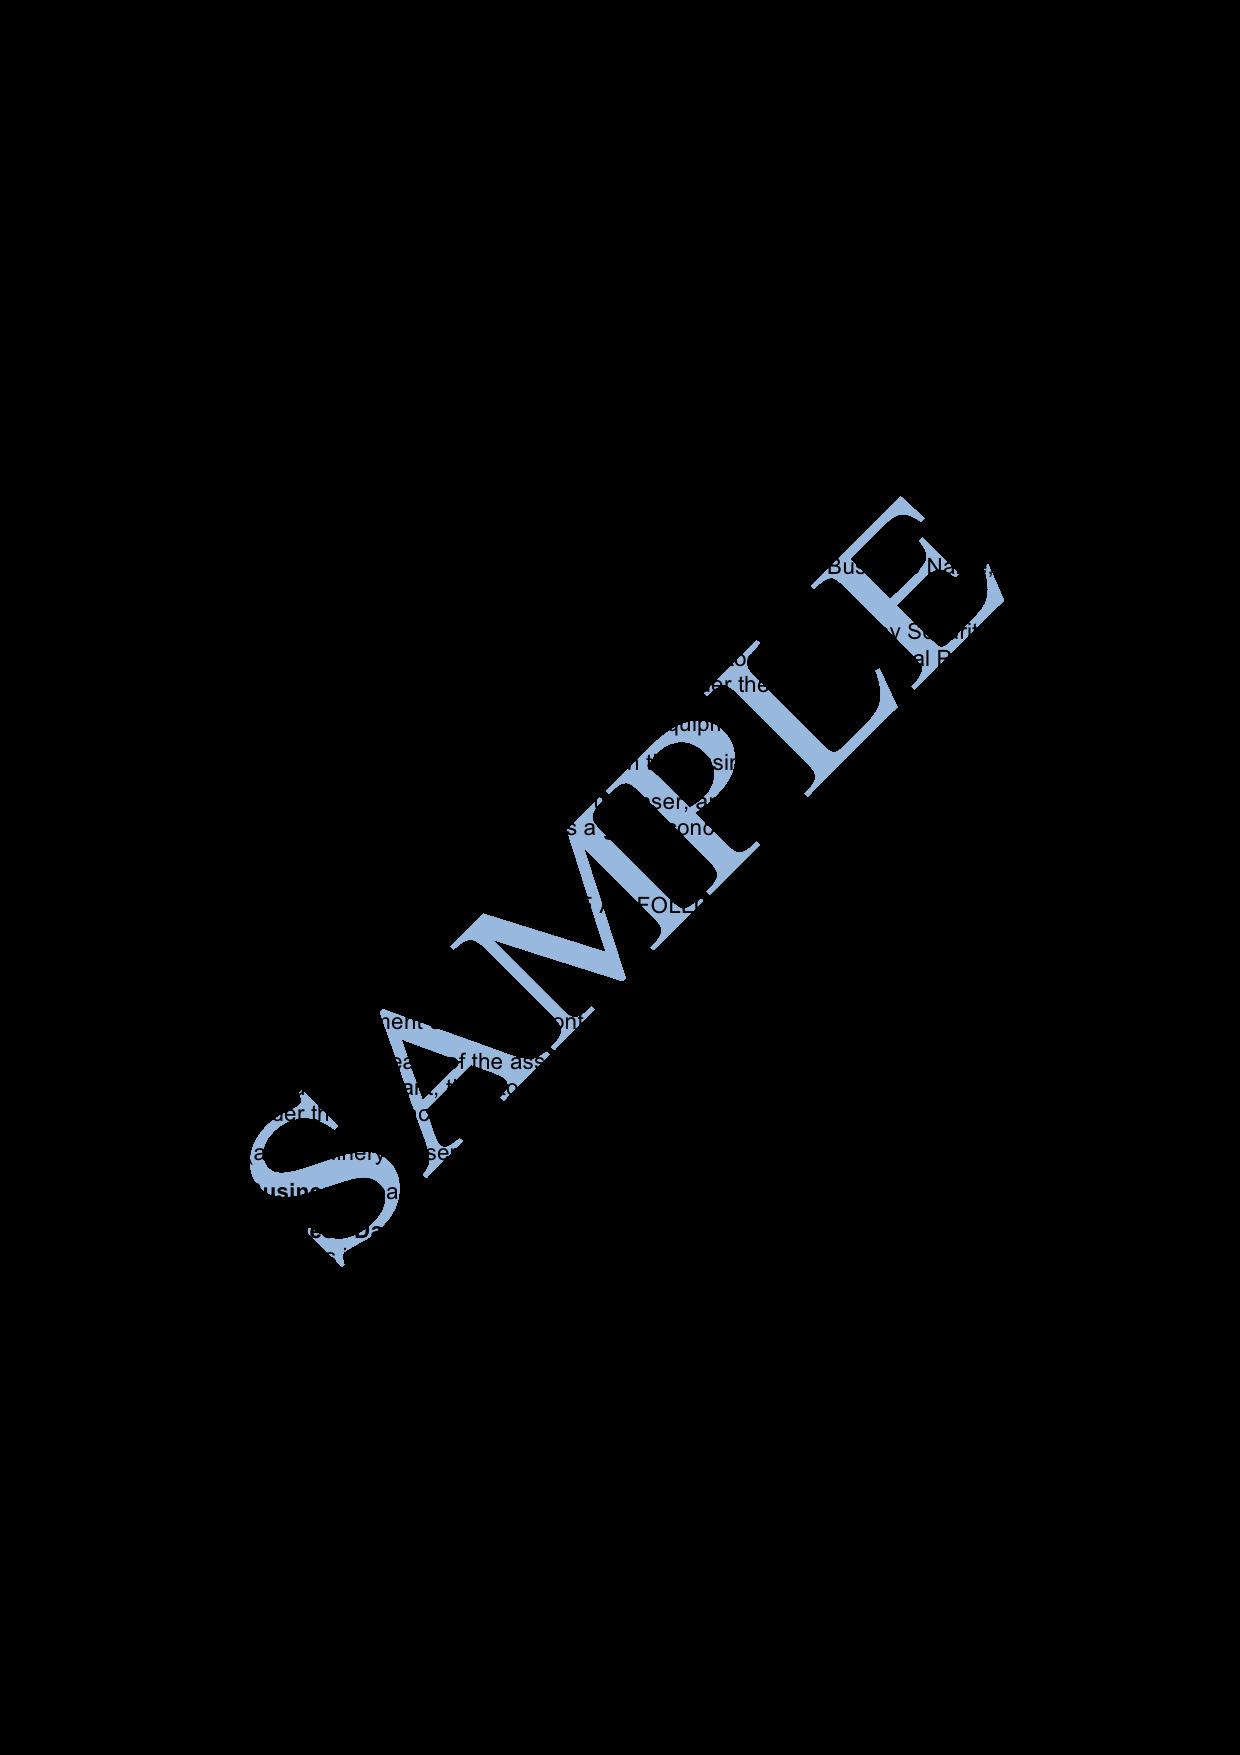 Business Sale Agreement Template Unique Business Sale Agreement Sample Lawpath